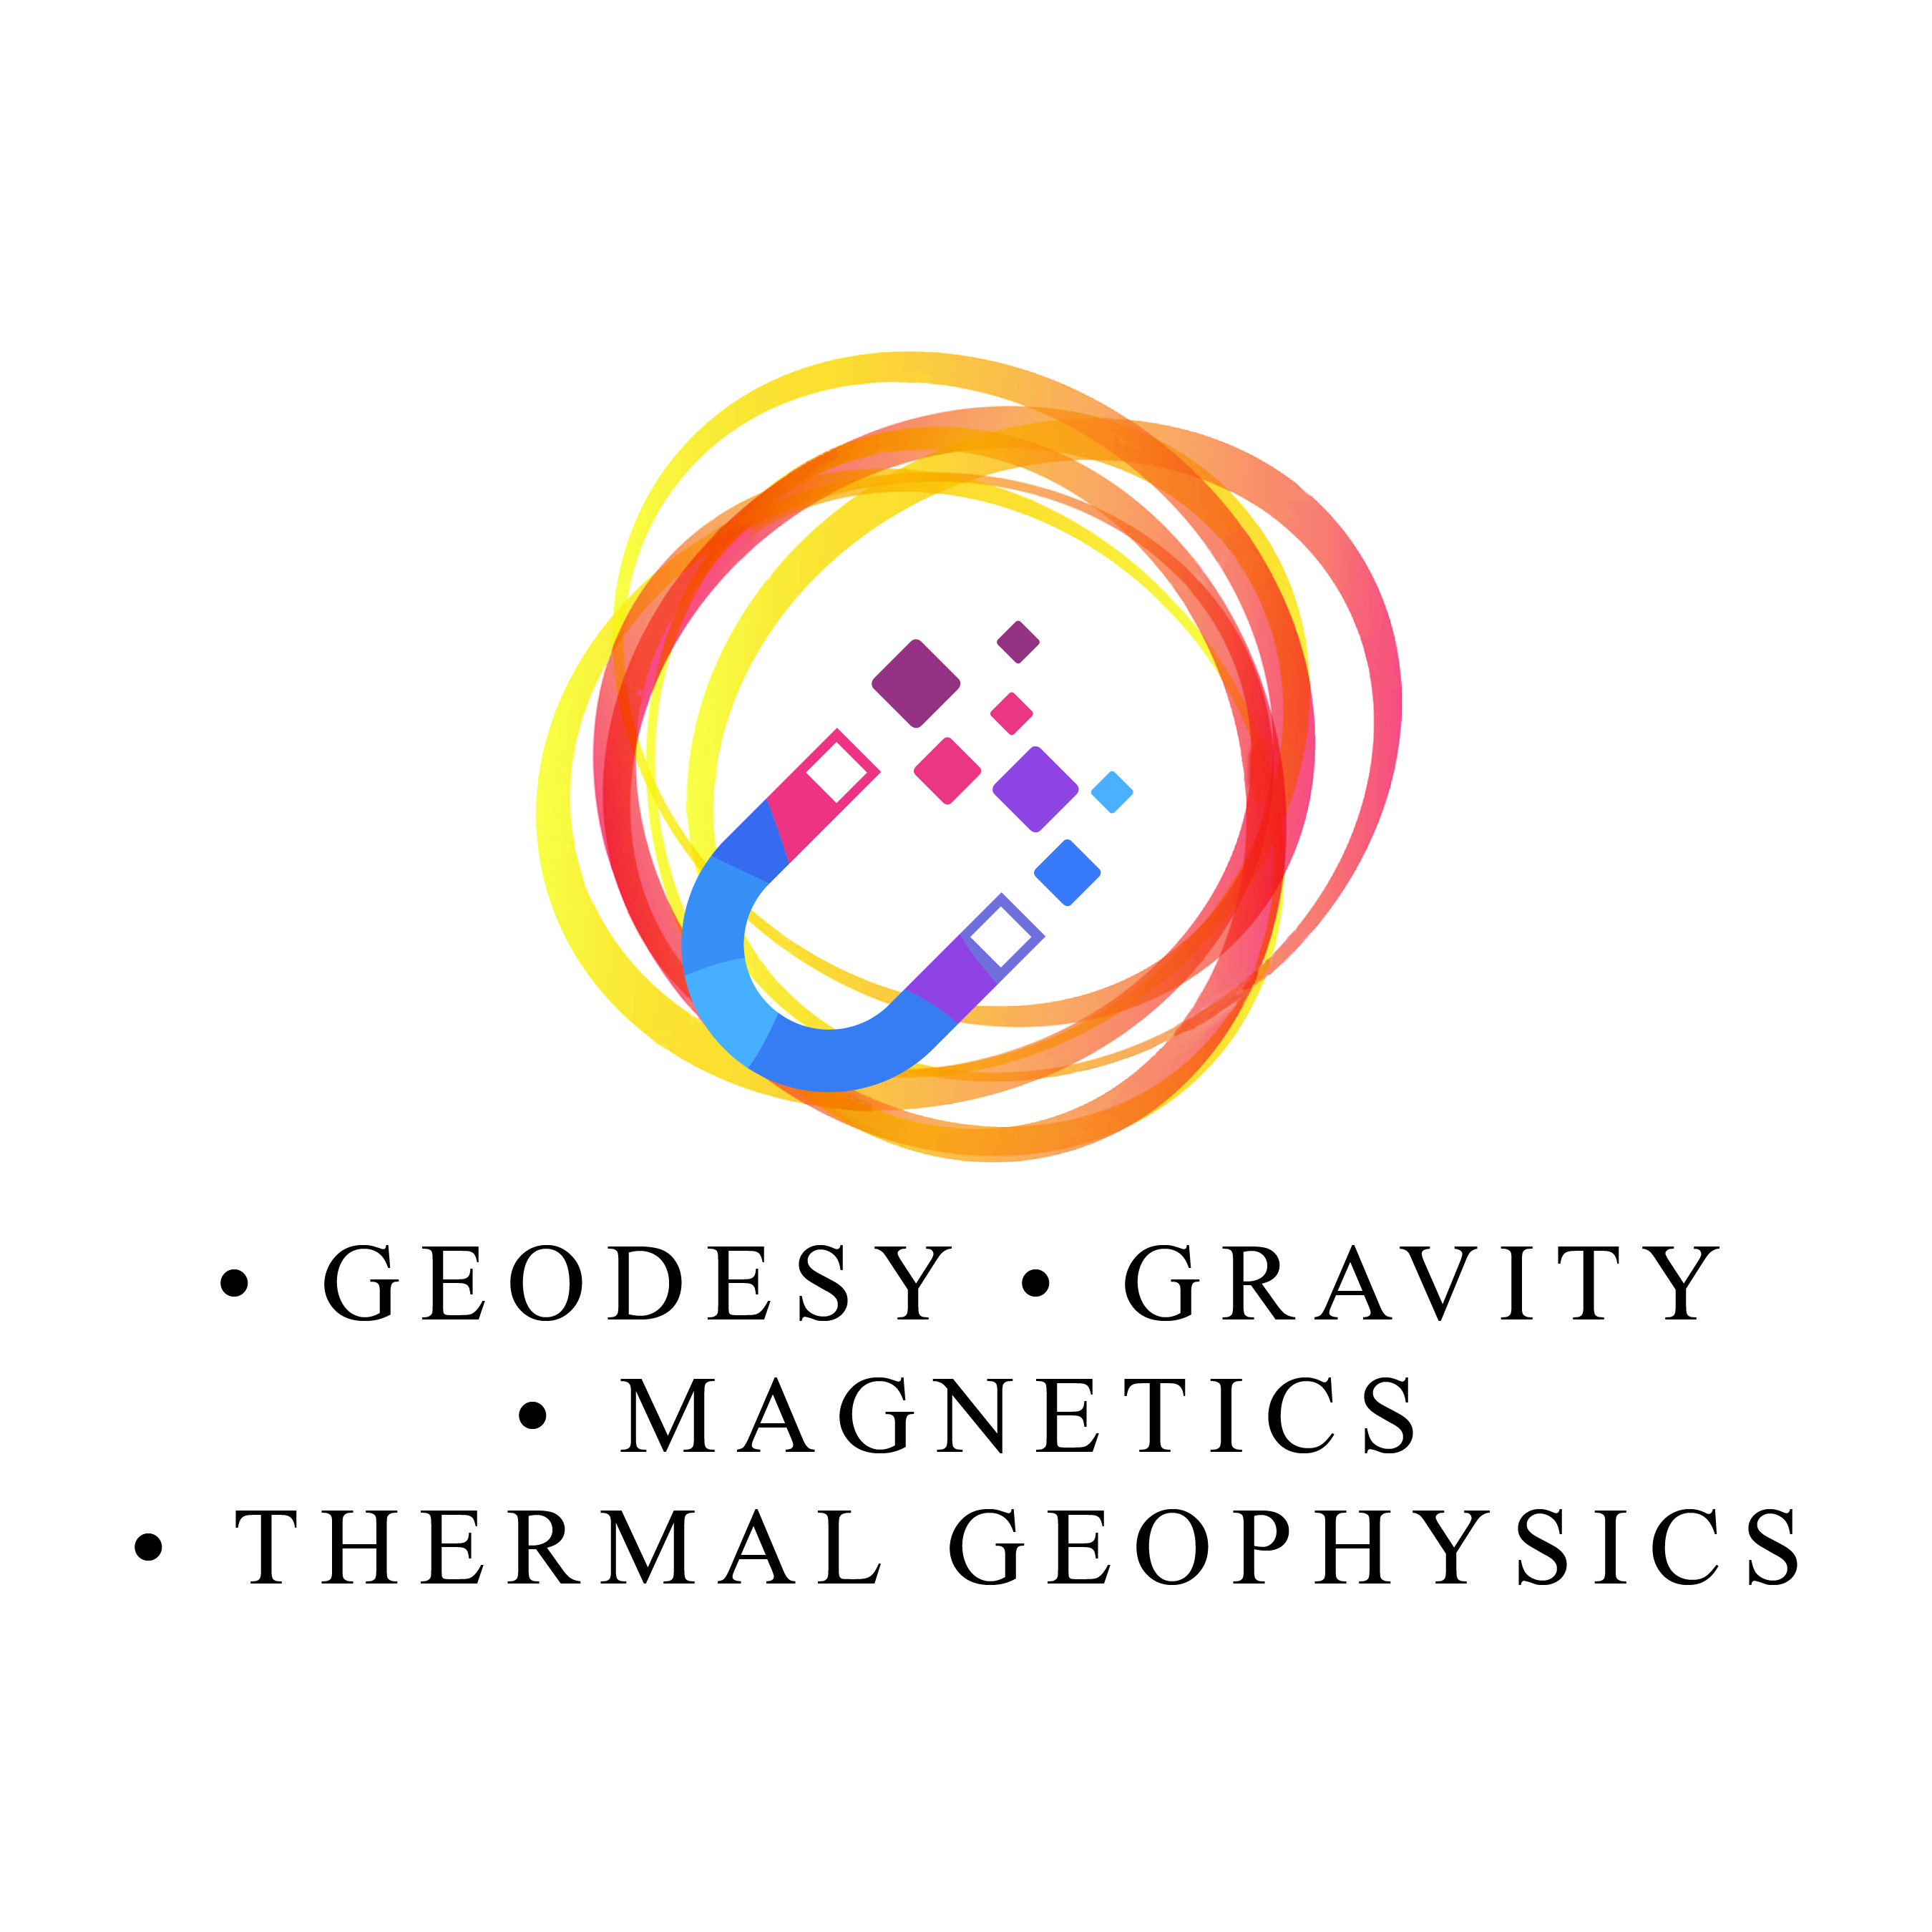 Geodesy, Gravity, Magnetics, Thermal Geophysics, Paleomagnetism and Rock Mechanics